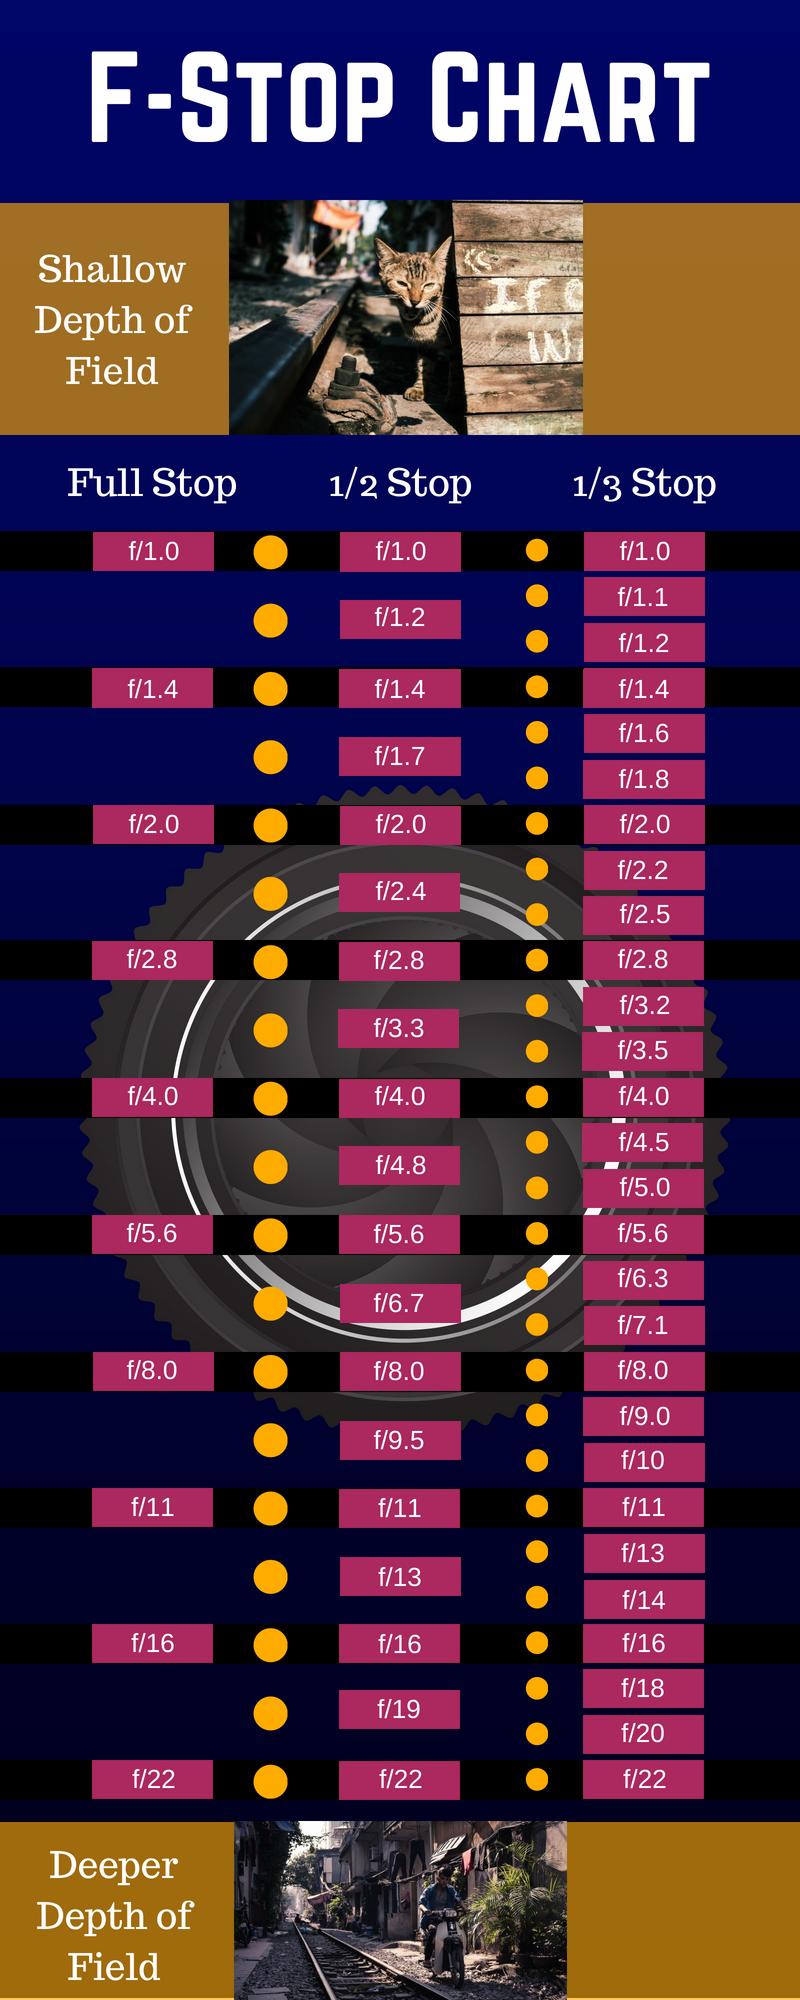 F-Stop Chart.jpg